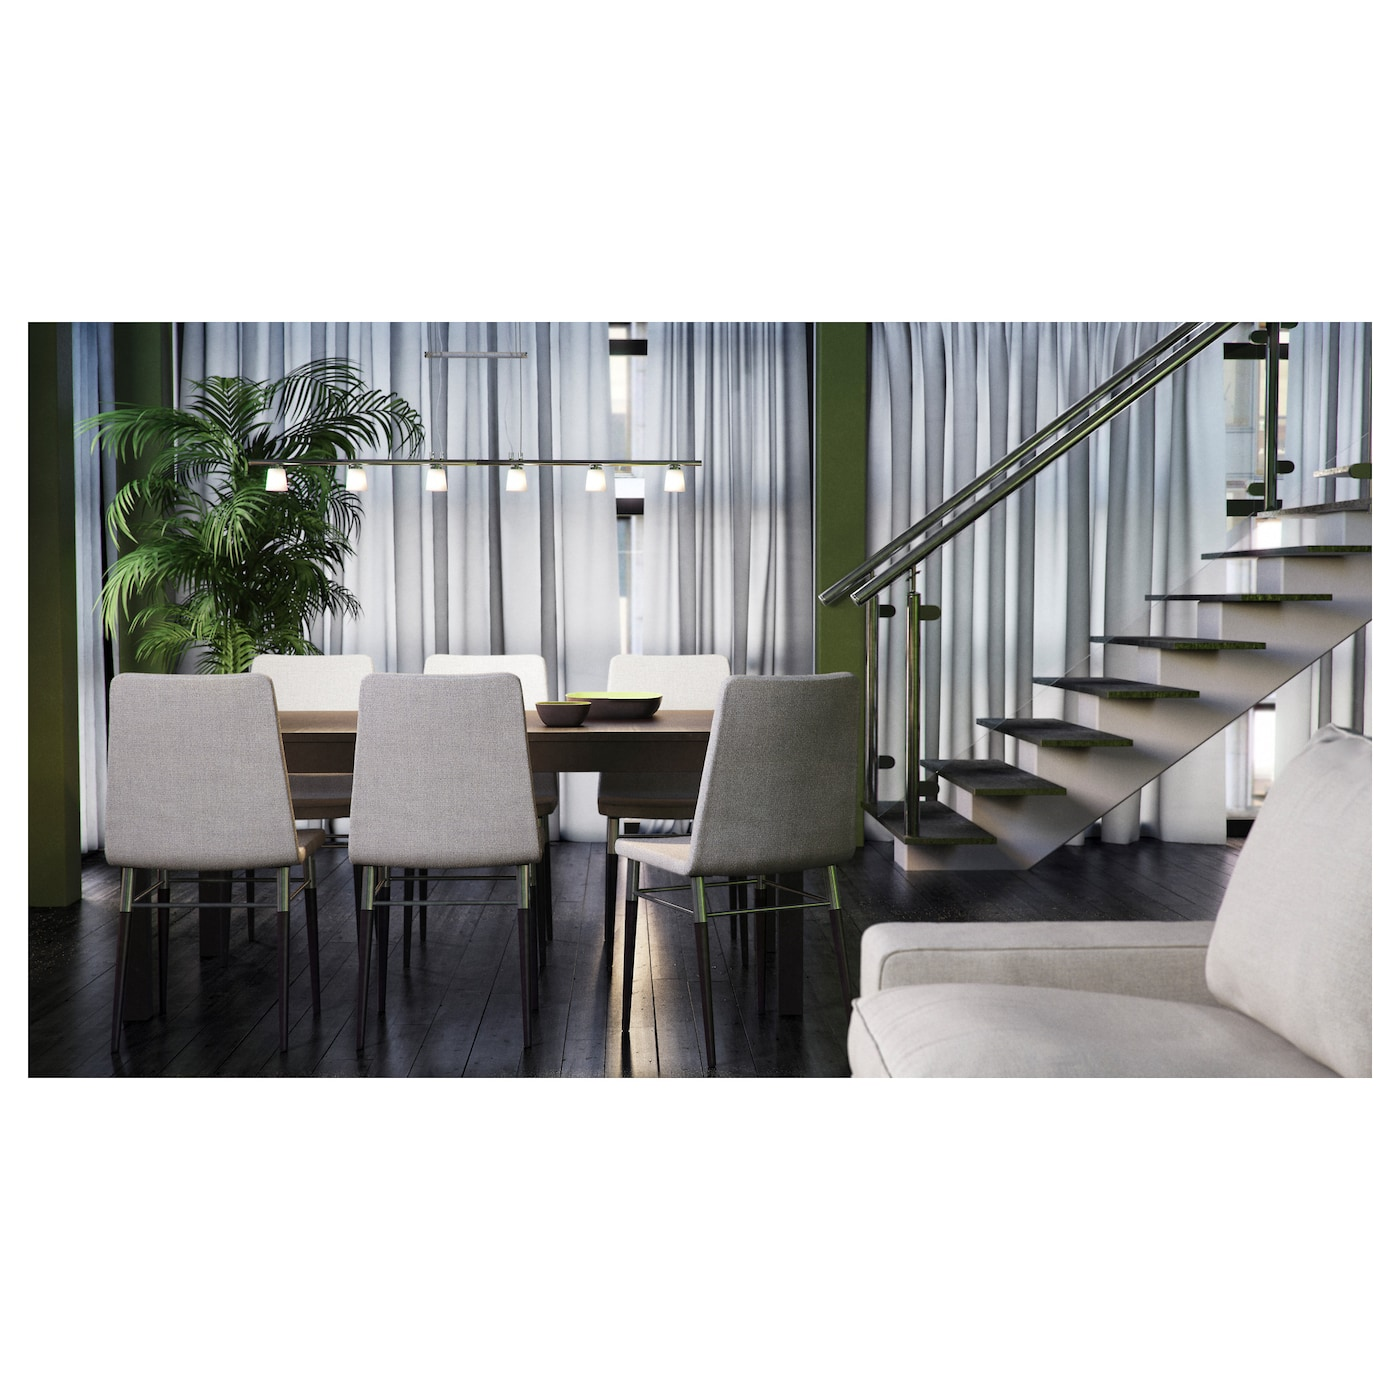 PREBEN Chair Brown blackten246 light grey IKEA : preben chair brown black tenC3B6 light grey0209610pe327044s5 from www.ikea.com size 2000 x 2000 jpeg 598kB